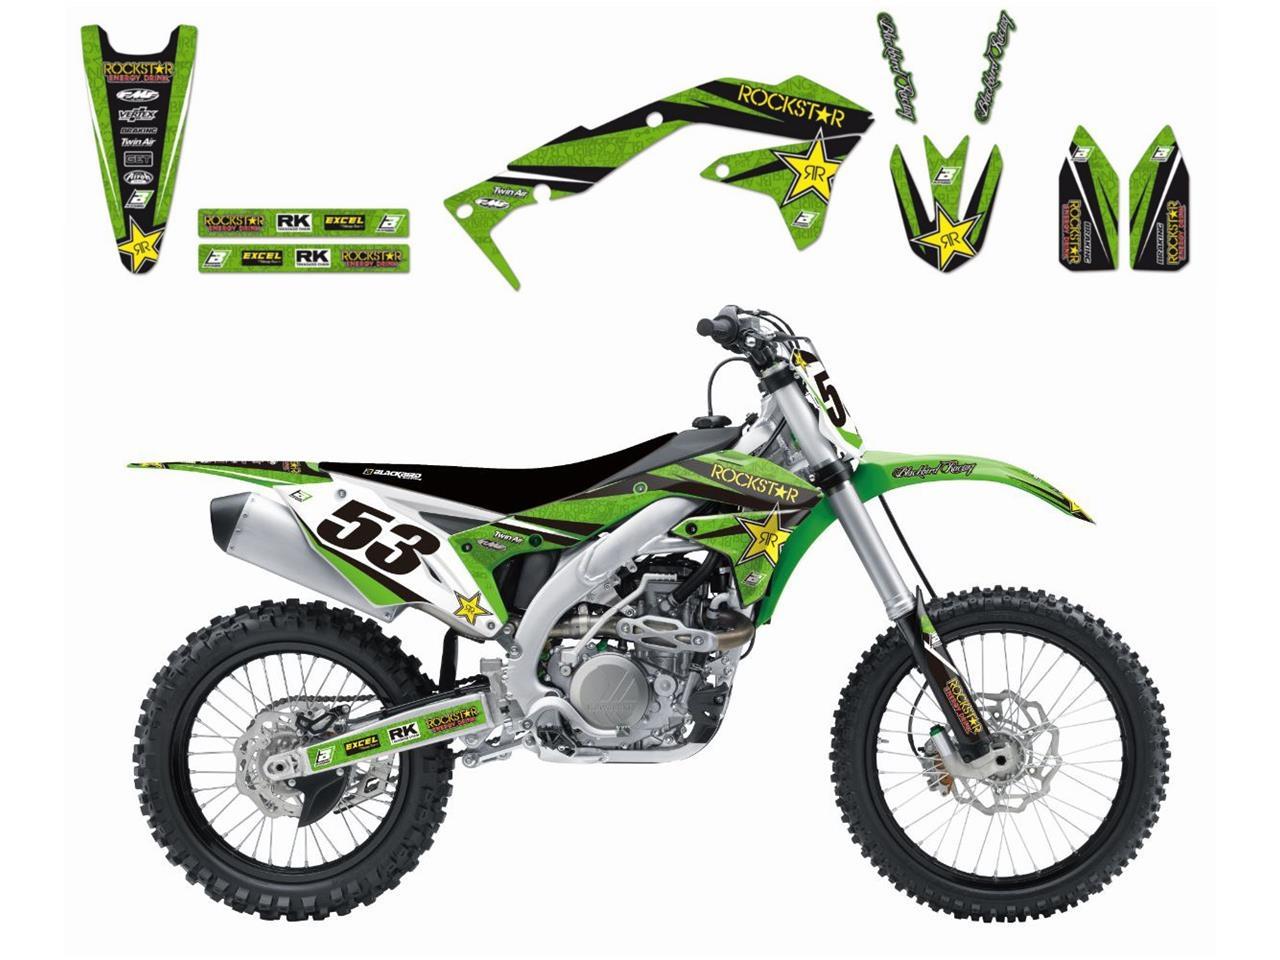 Kit déco Blackbird Rockstar Energy Kawasaki 450 KX-F 12-15 vert